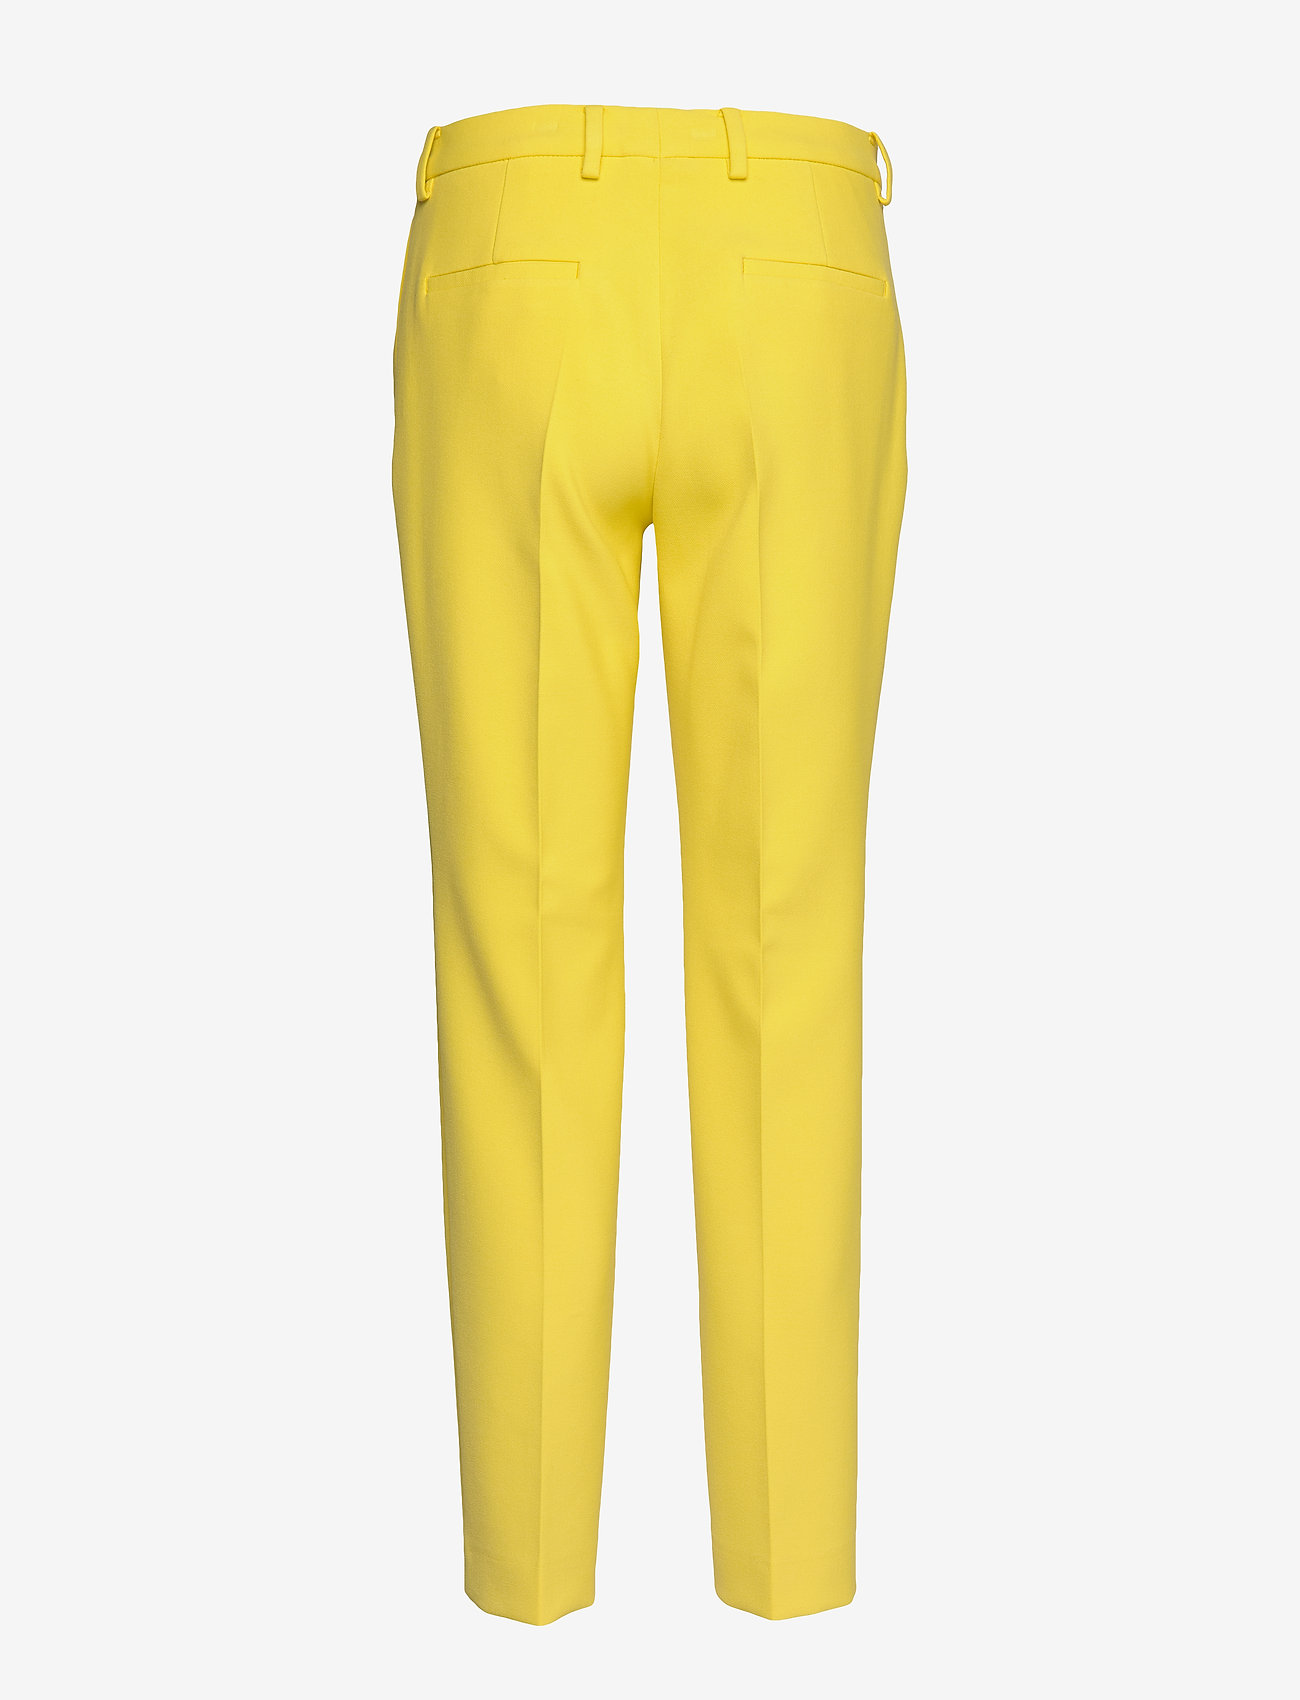 SAND - 3596 - Dori A - slim fit broeken - pale yellow - 1